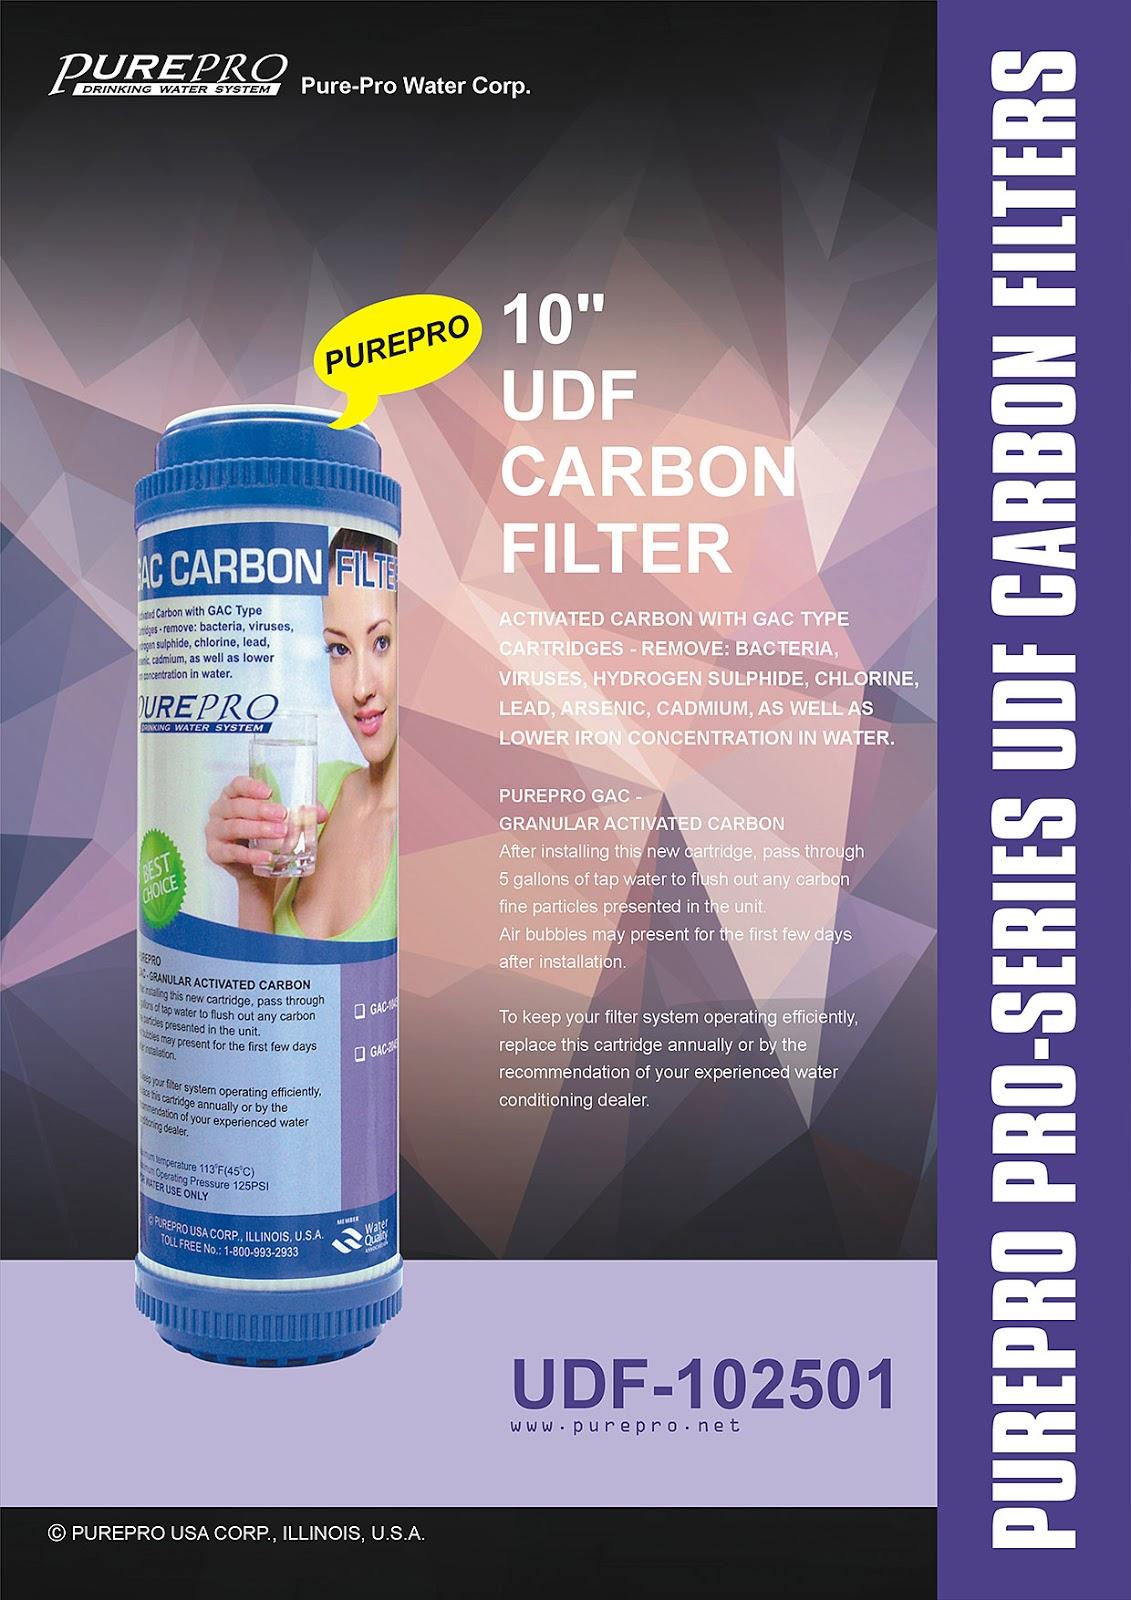 "PurePro® USA 10"" UDF Carbon Filter - PurePro UDF-102501"